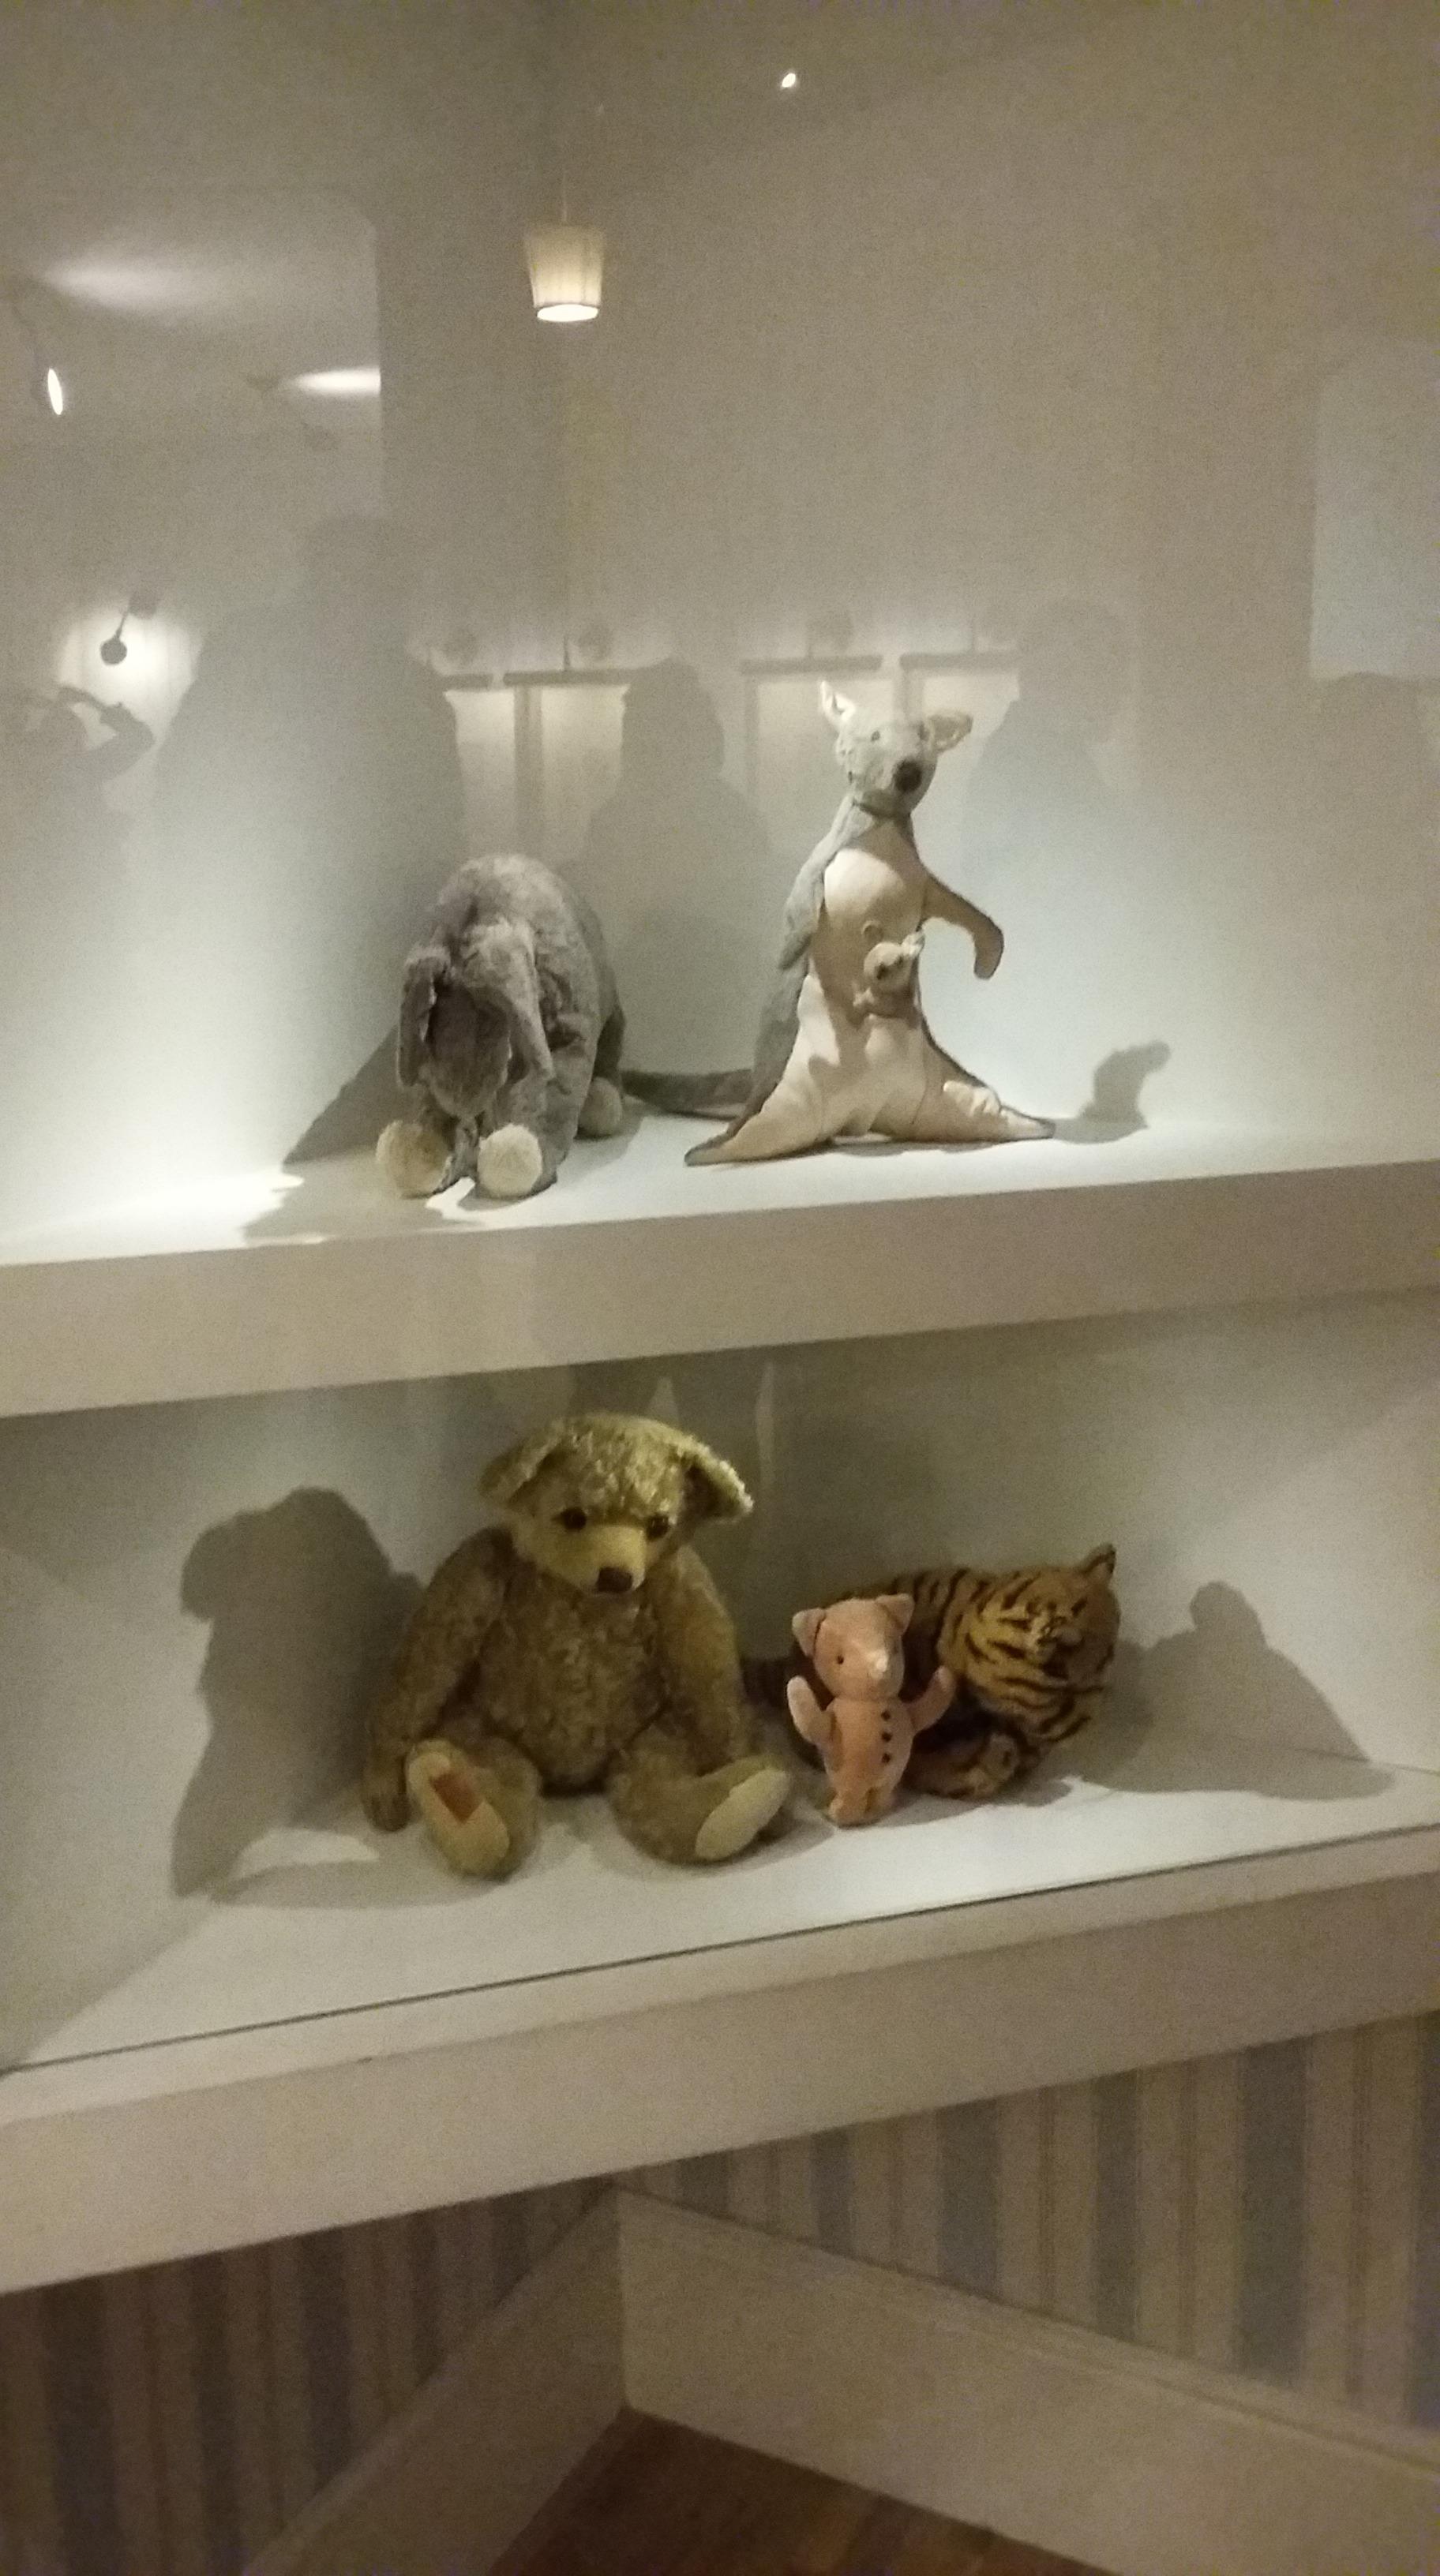 Pooh-themed toys